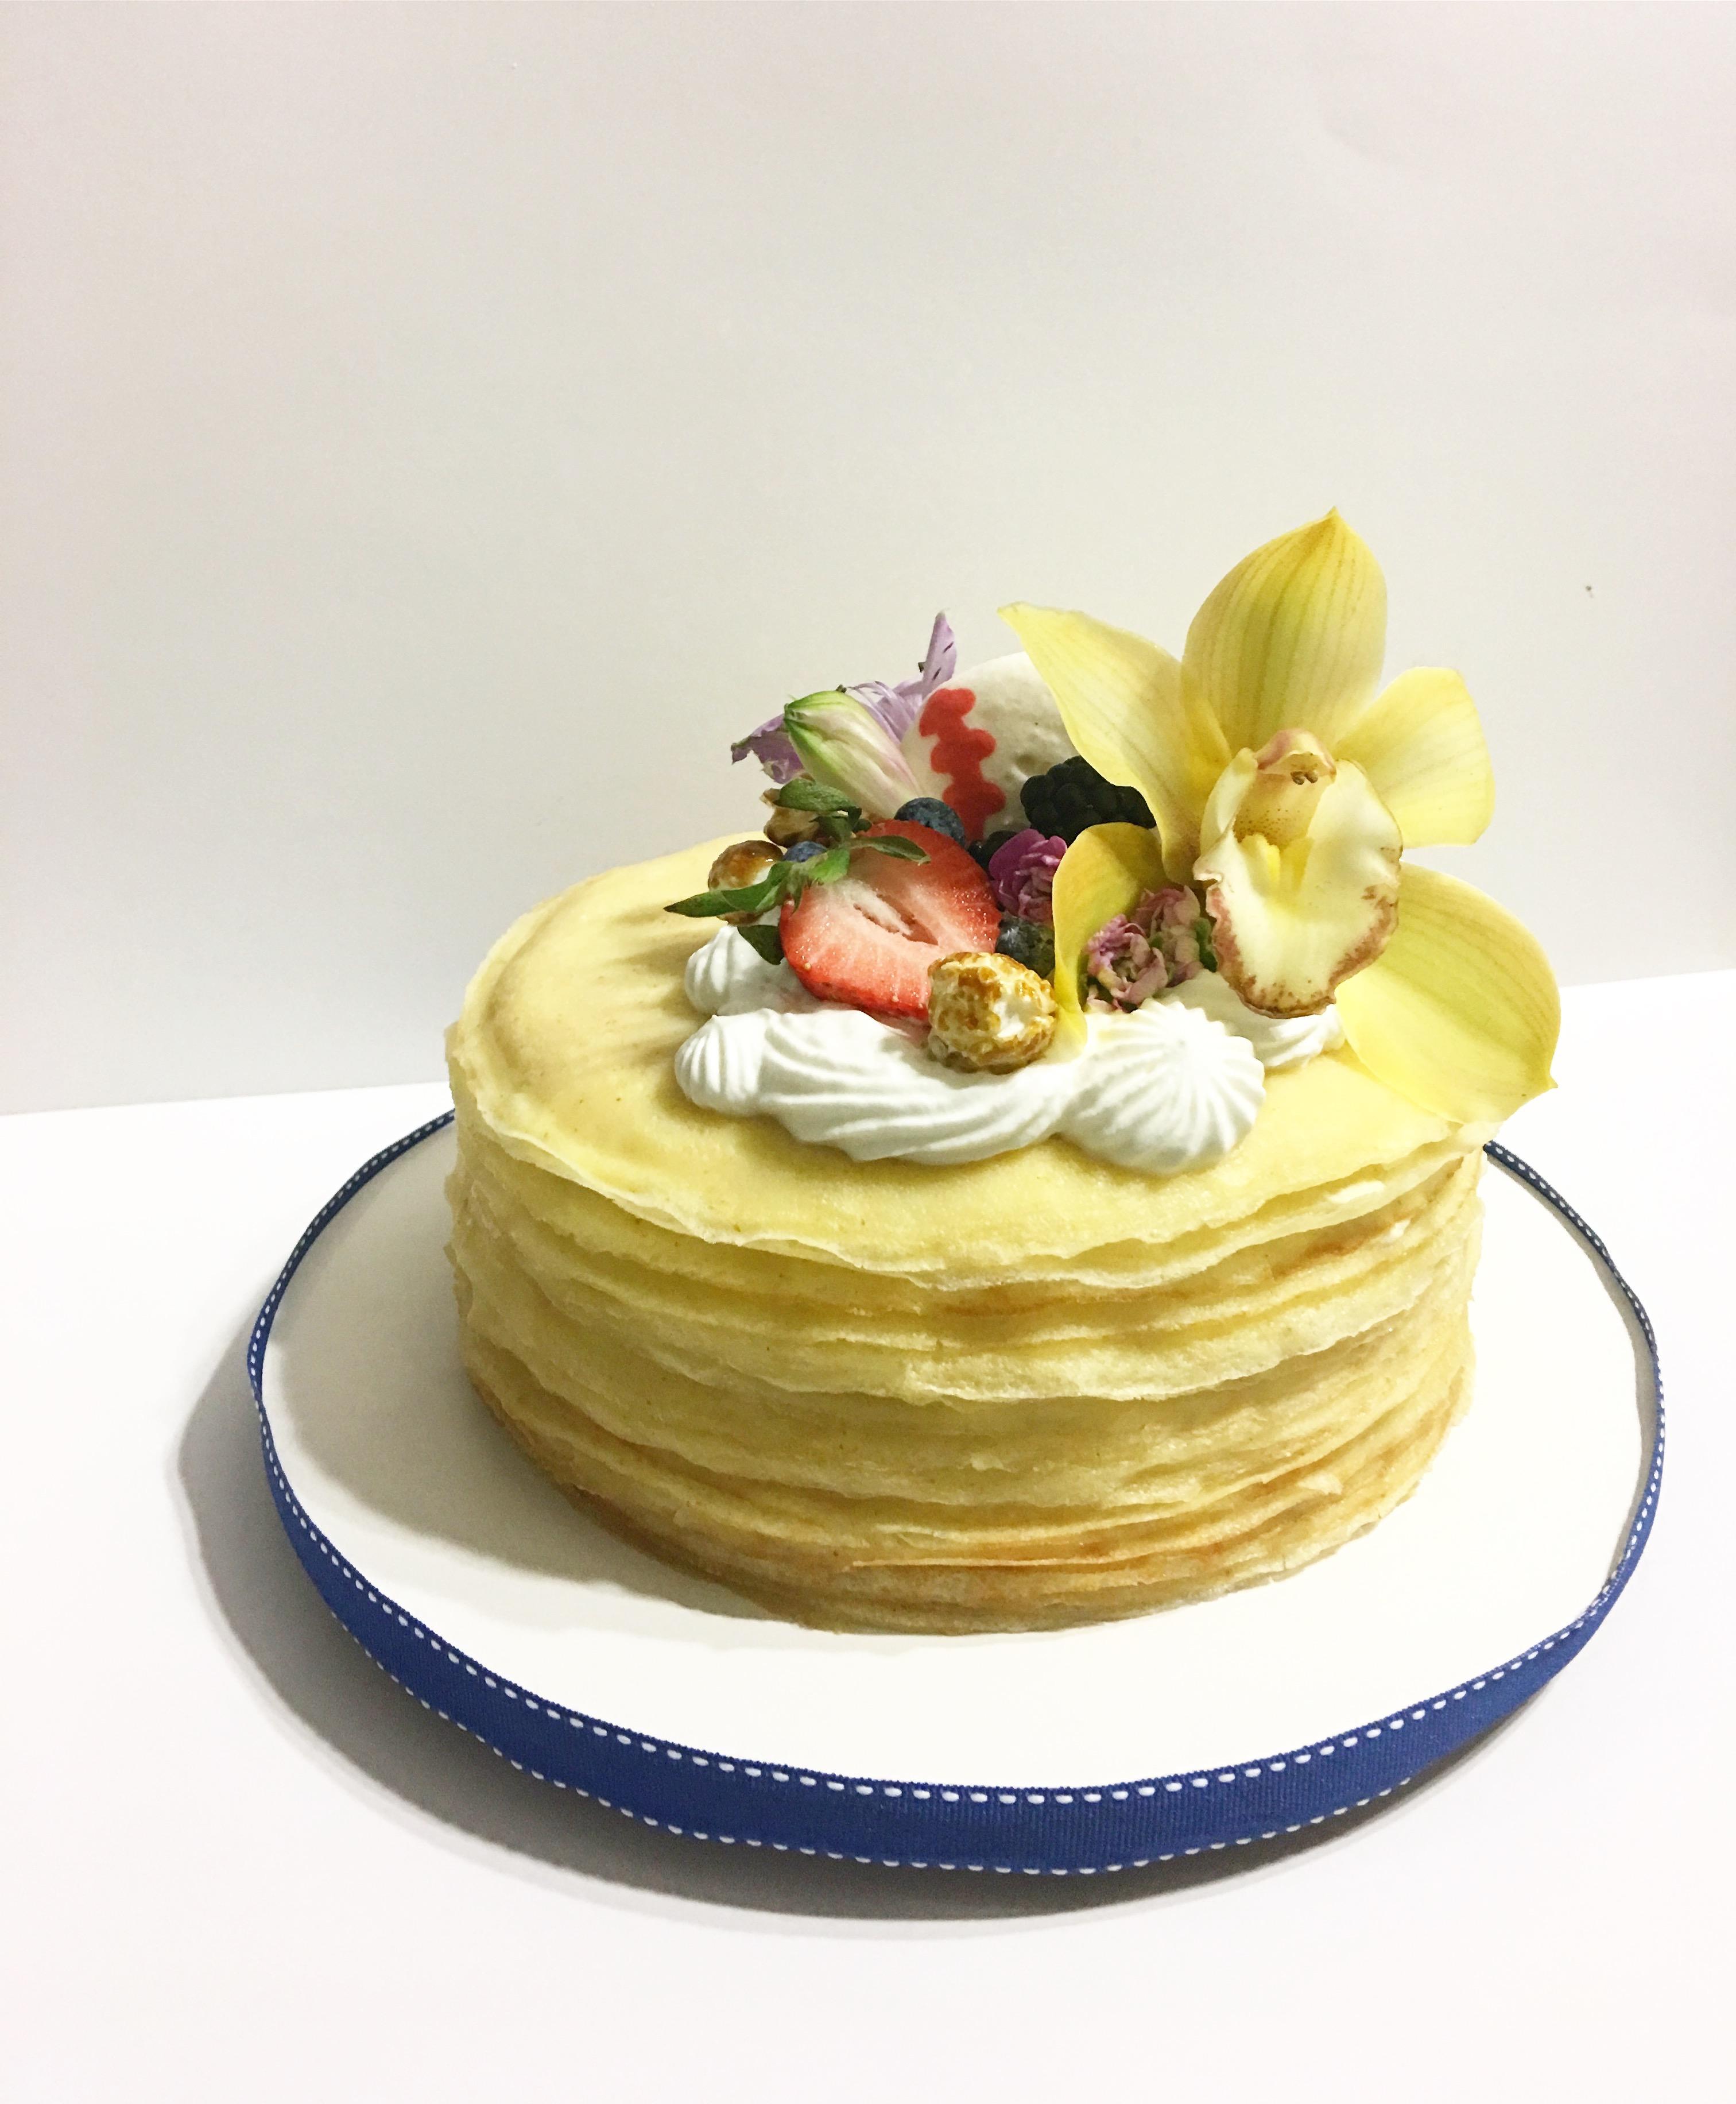 Lilikoi Crepe Cake